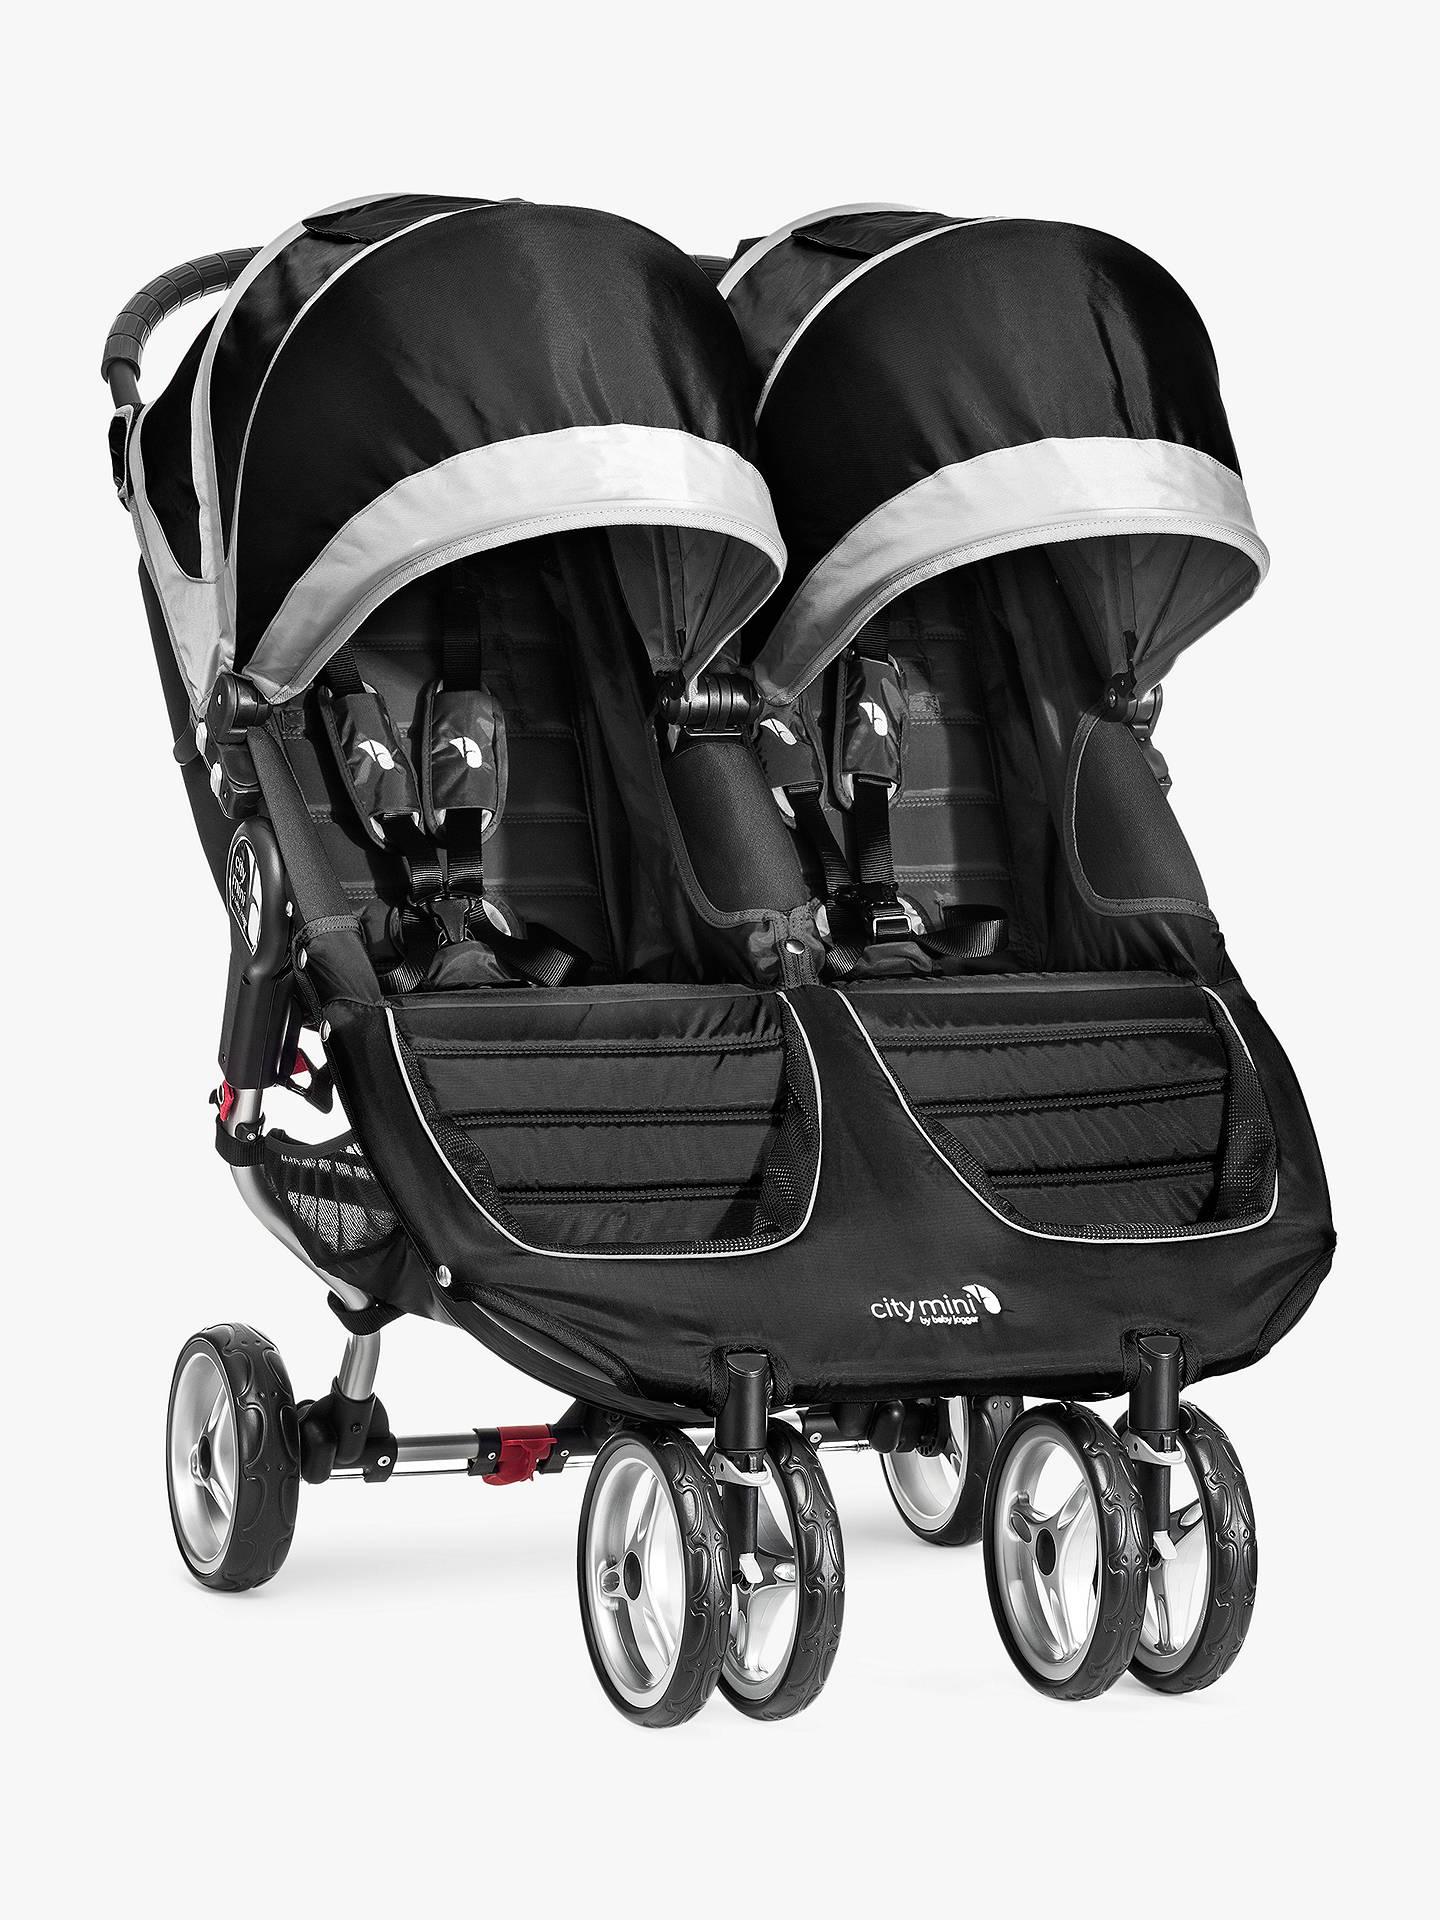 Baby Jogger City Mini Twin Pushchair Black At John Lewis